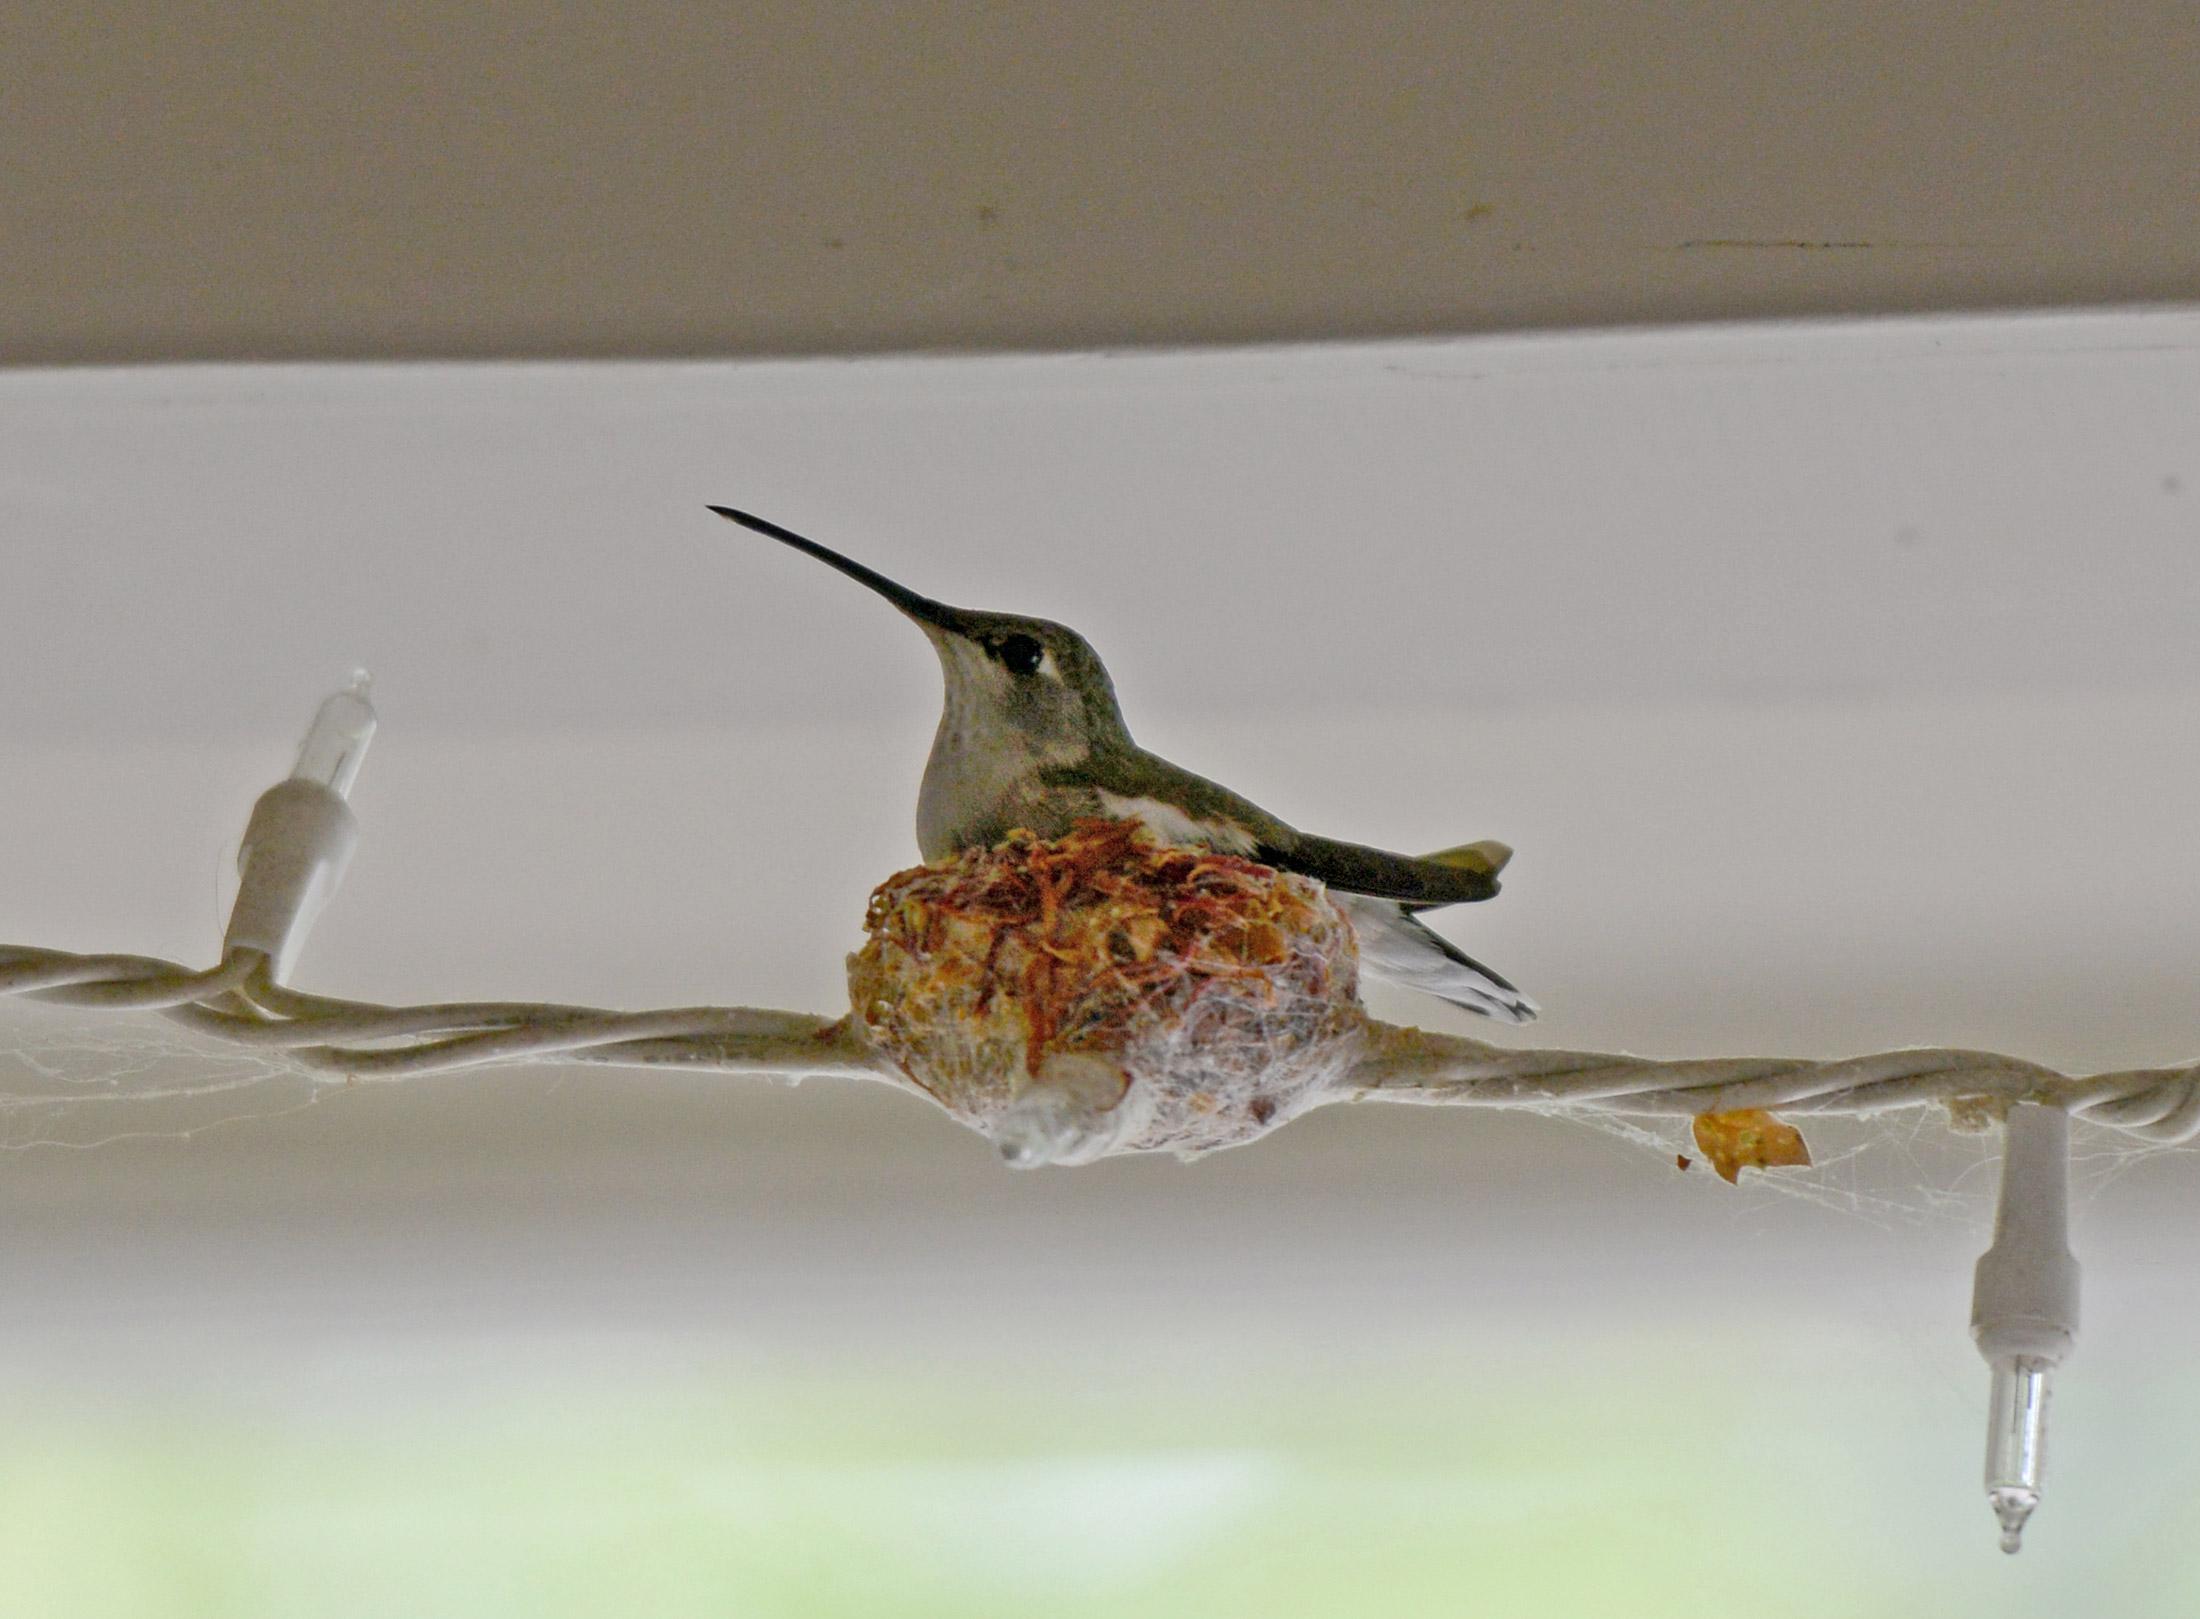 Hummingbird Nests Archives - Imágenes de Hummingbird